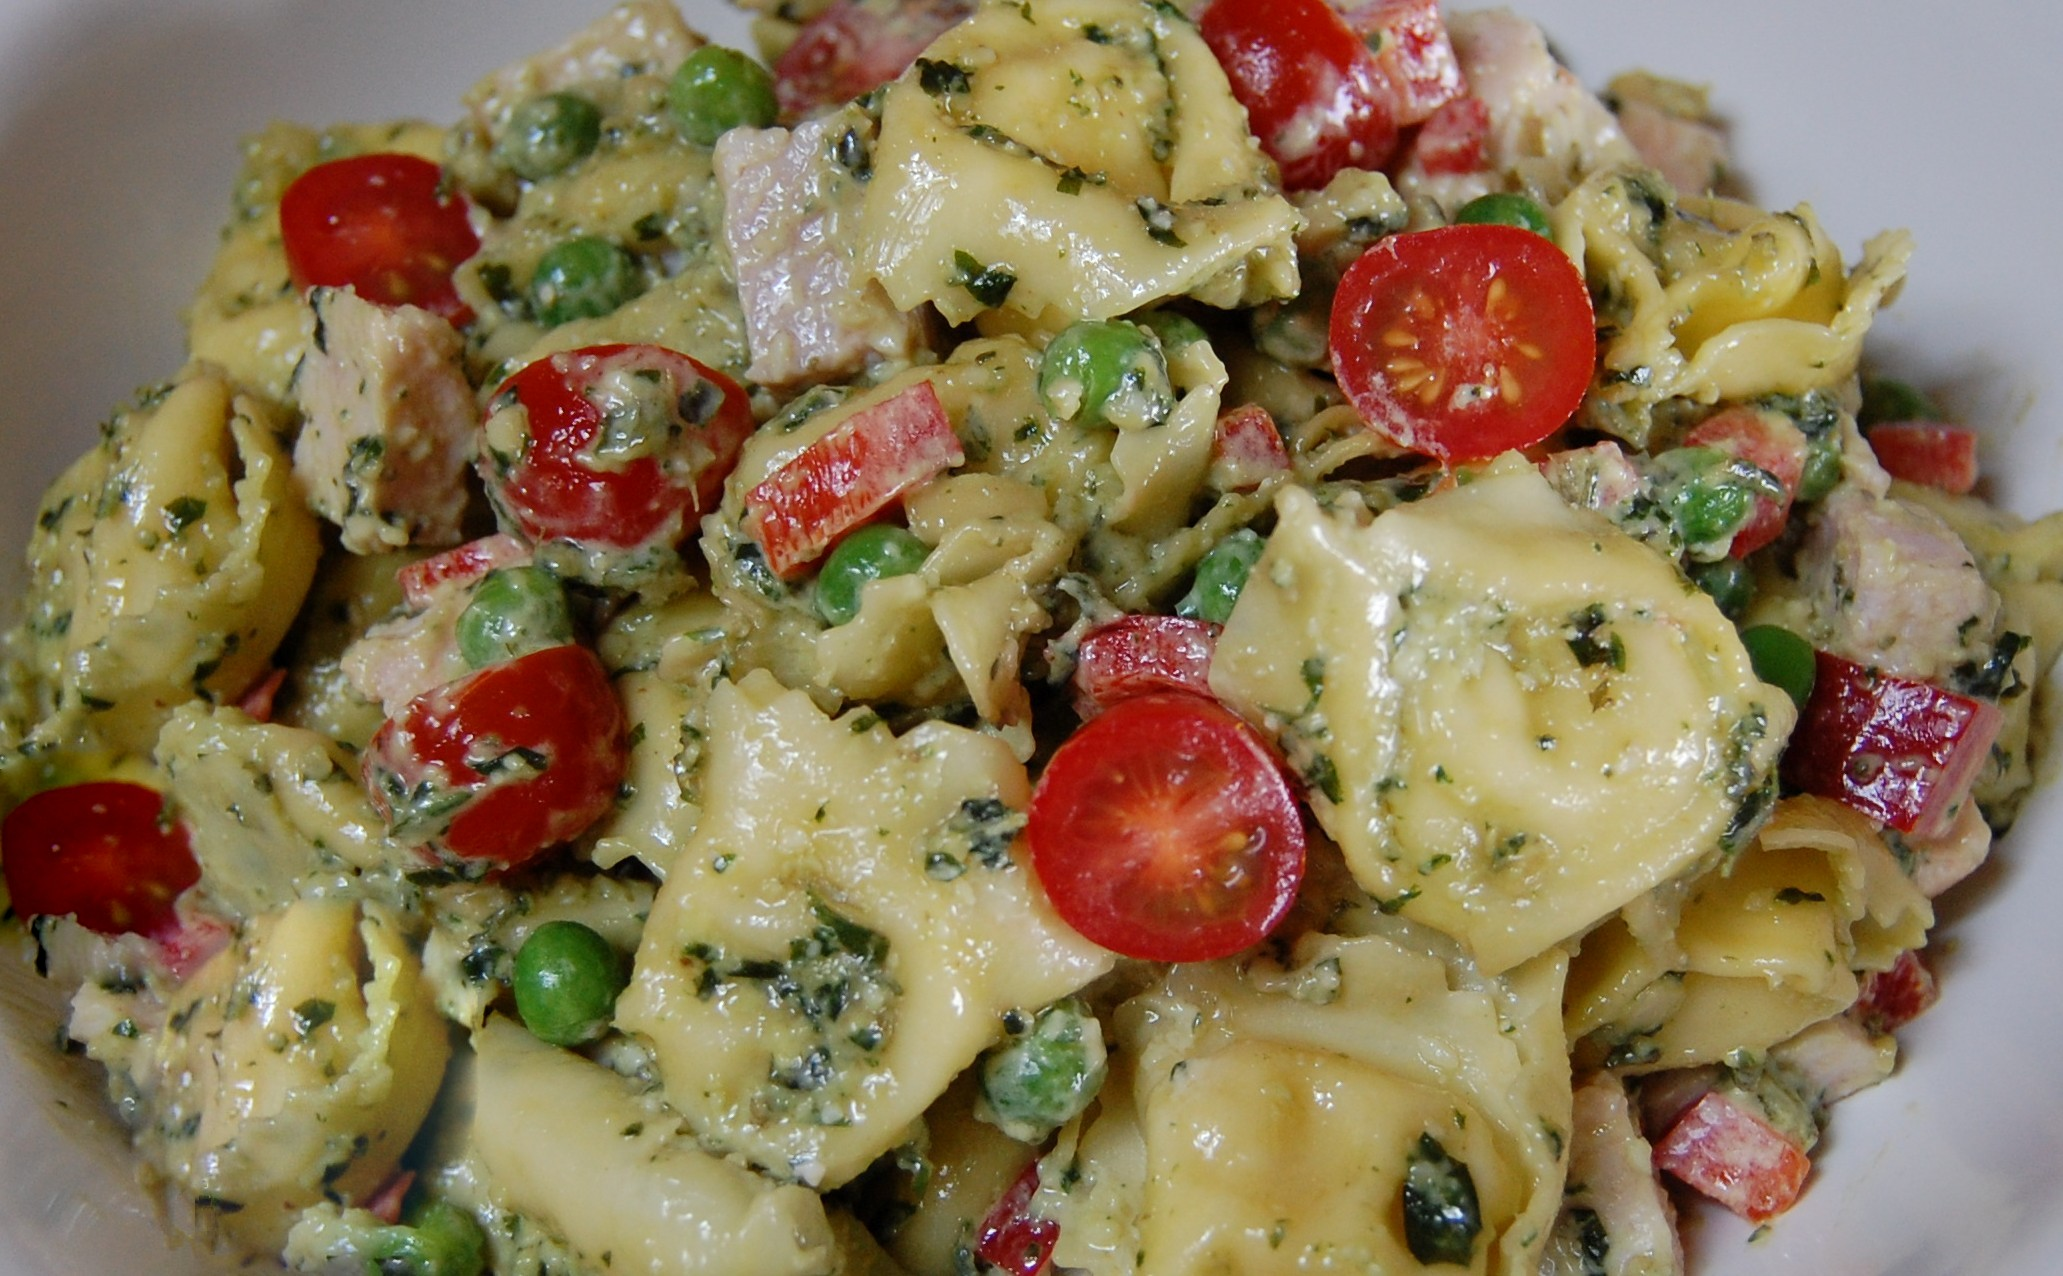 filed under pasta salads salads